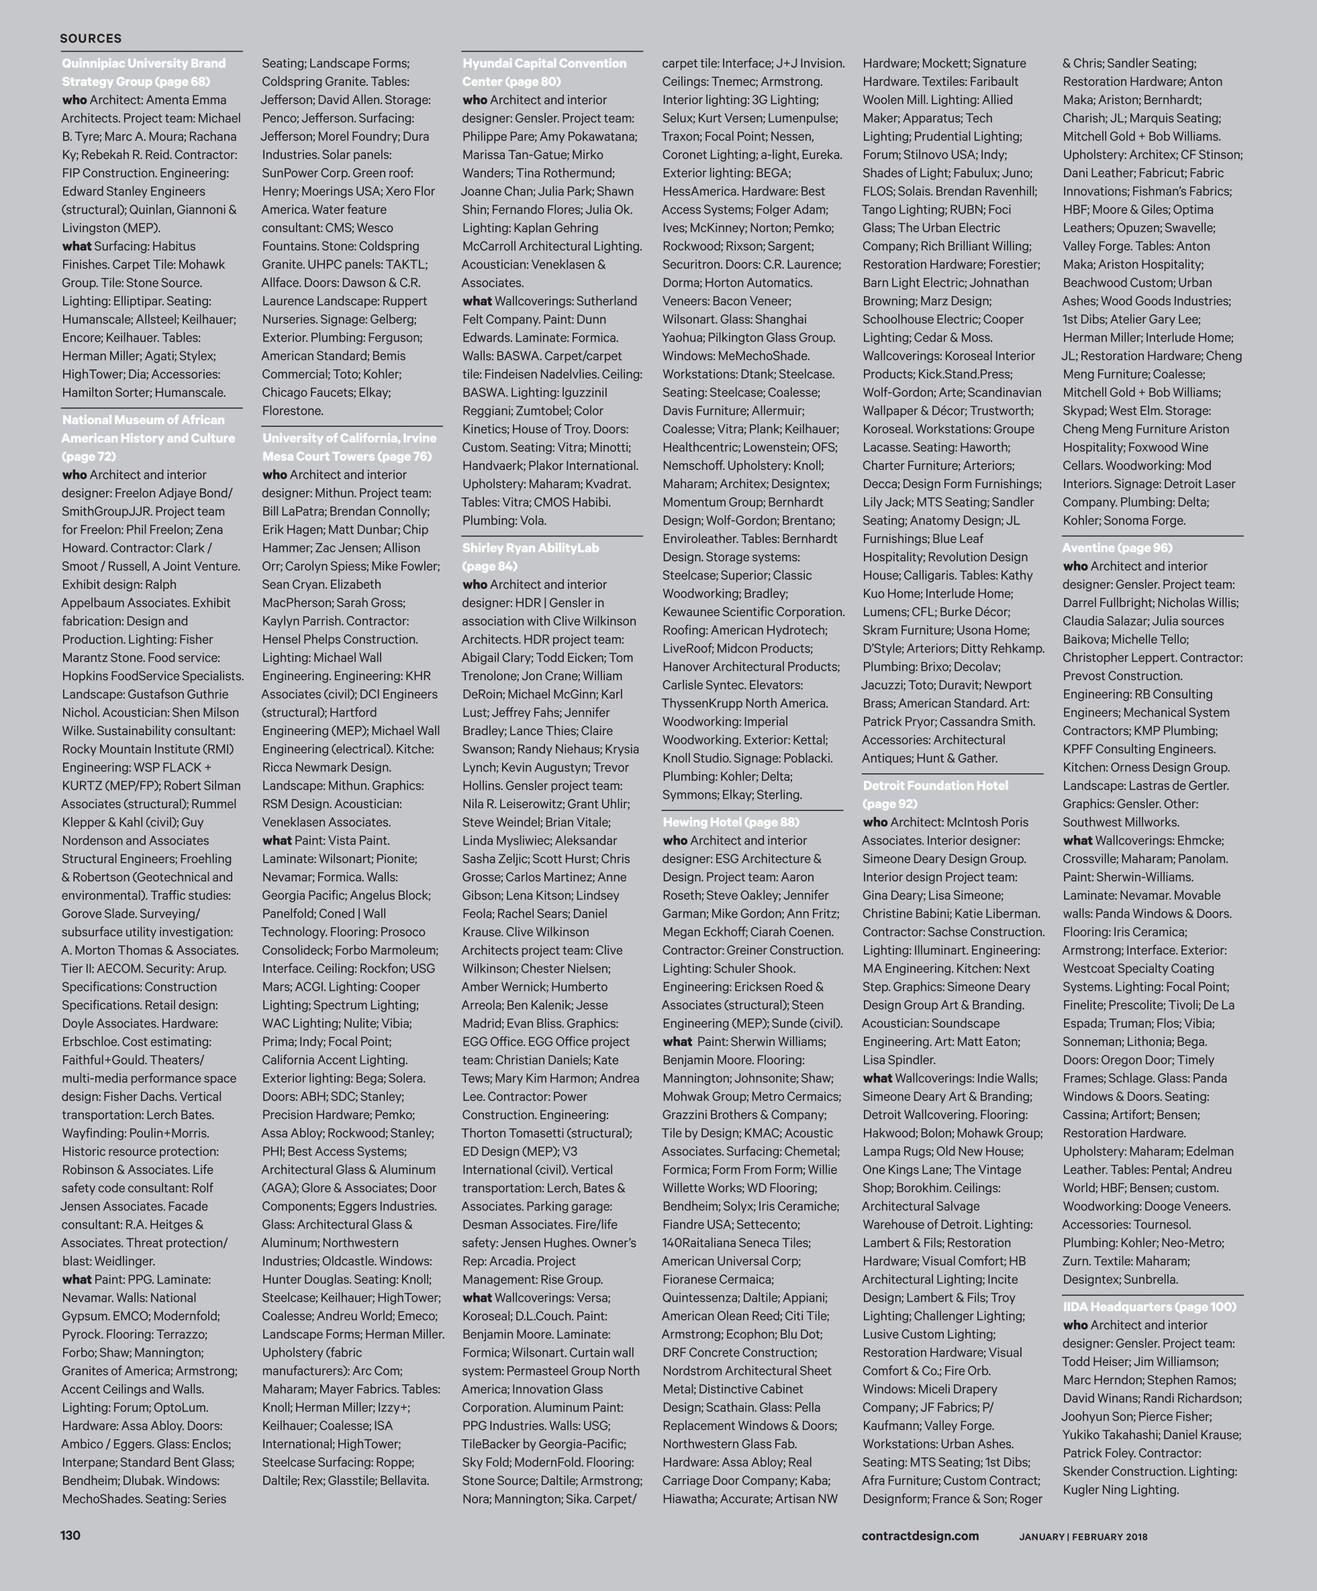 Contract Magazine - January/February 2018 [130 - 131]